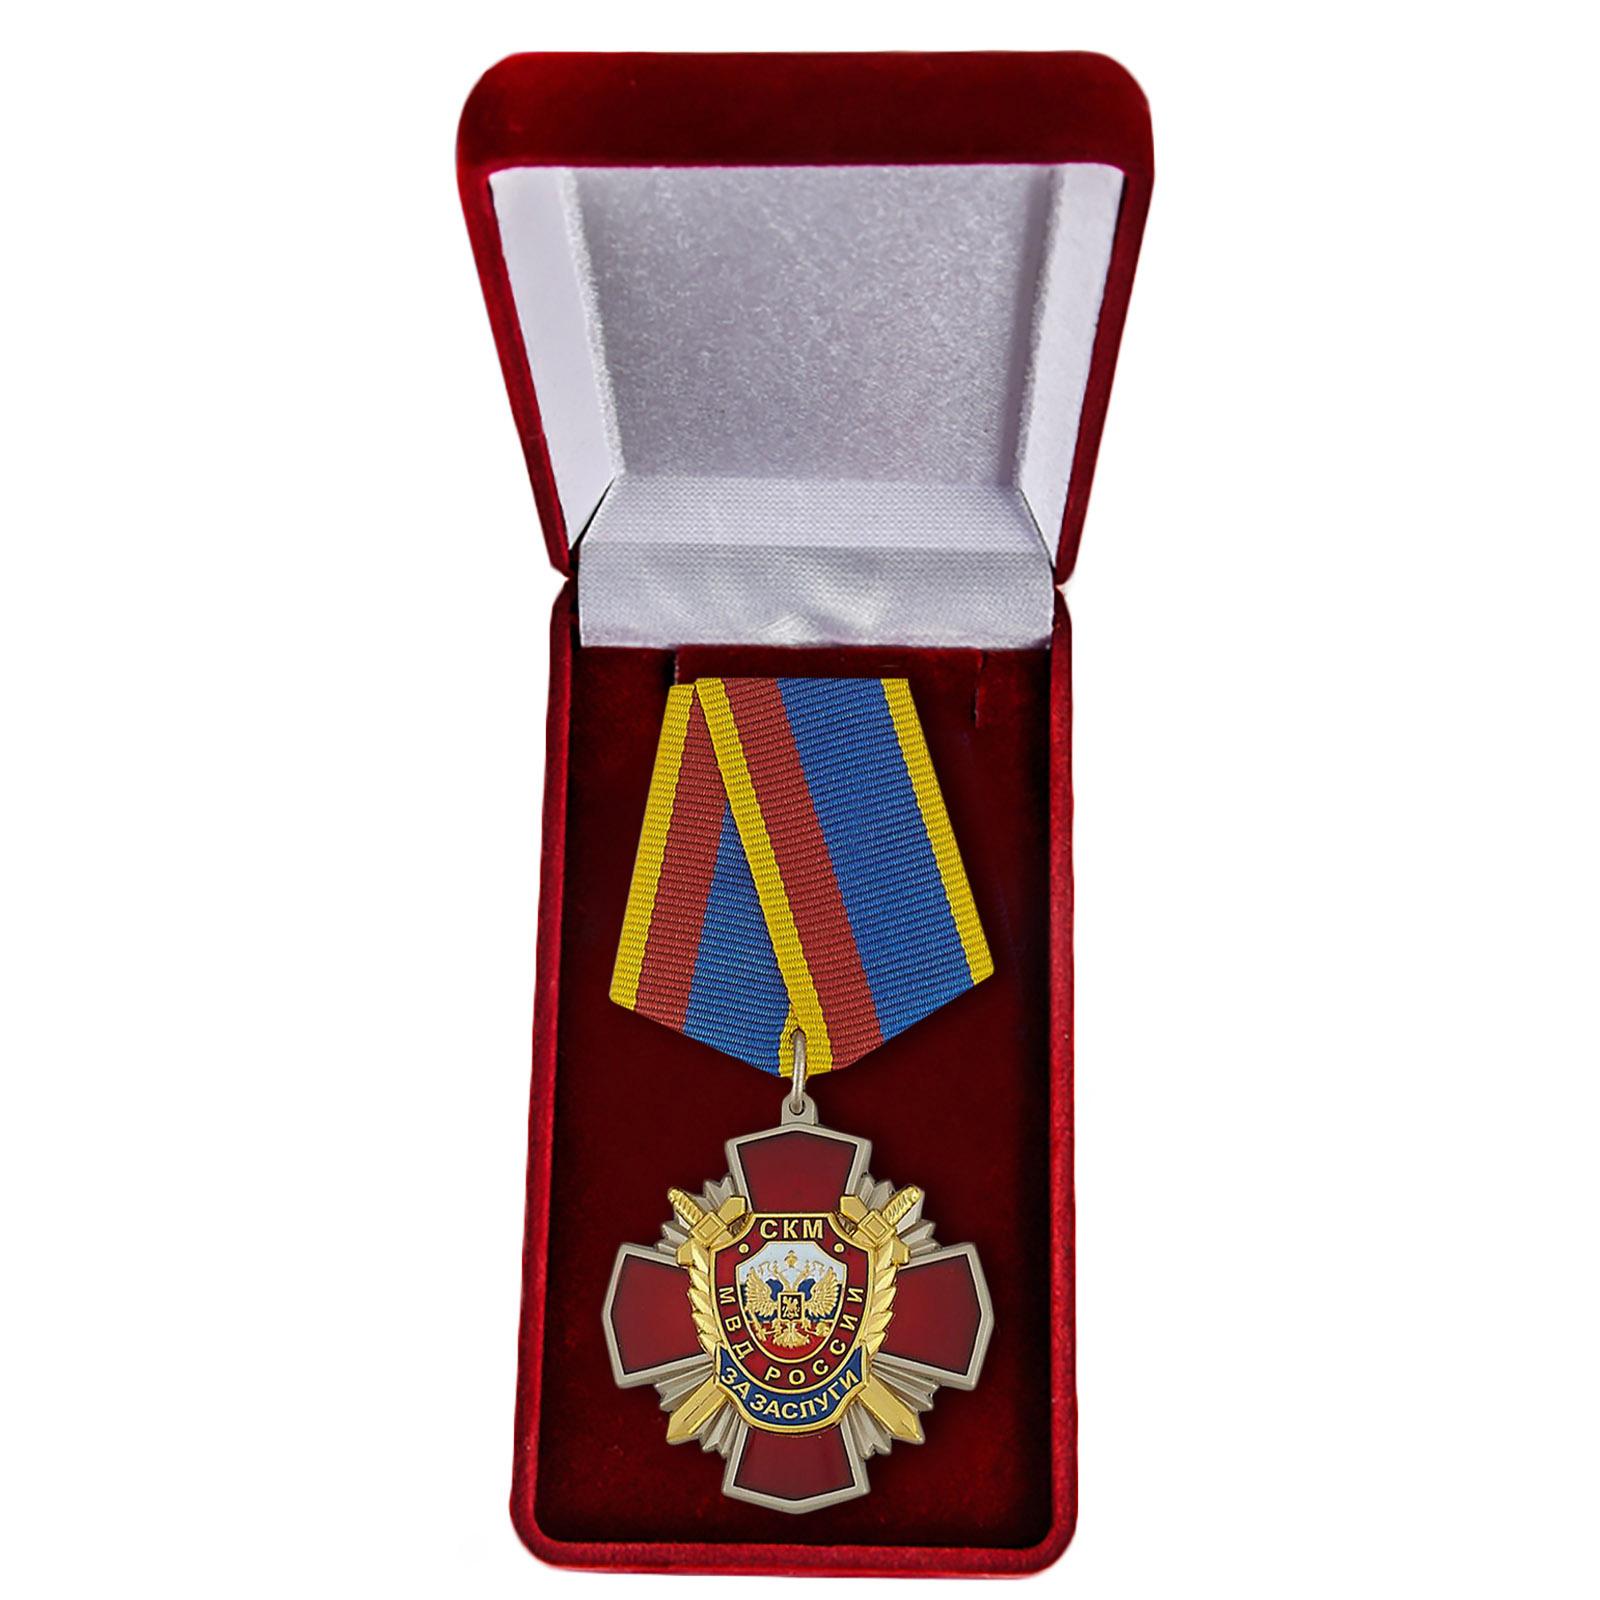 "Медаль УГРО ""За заслуги"" купить в Военпро"